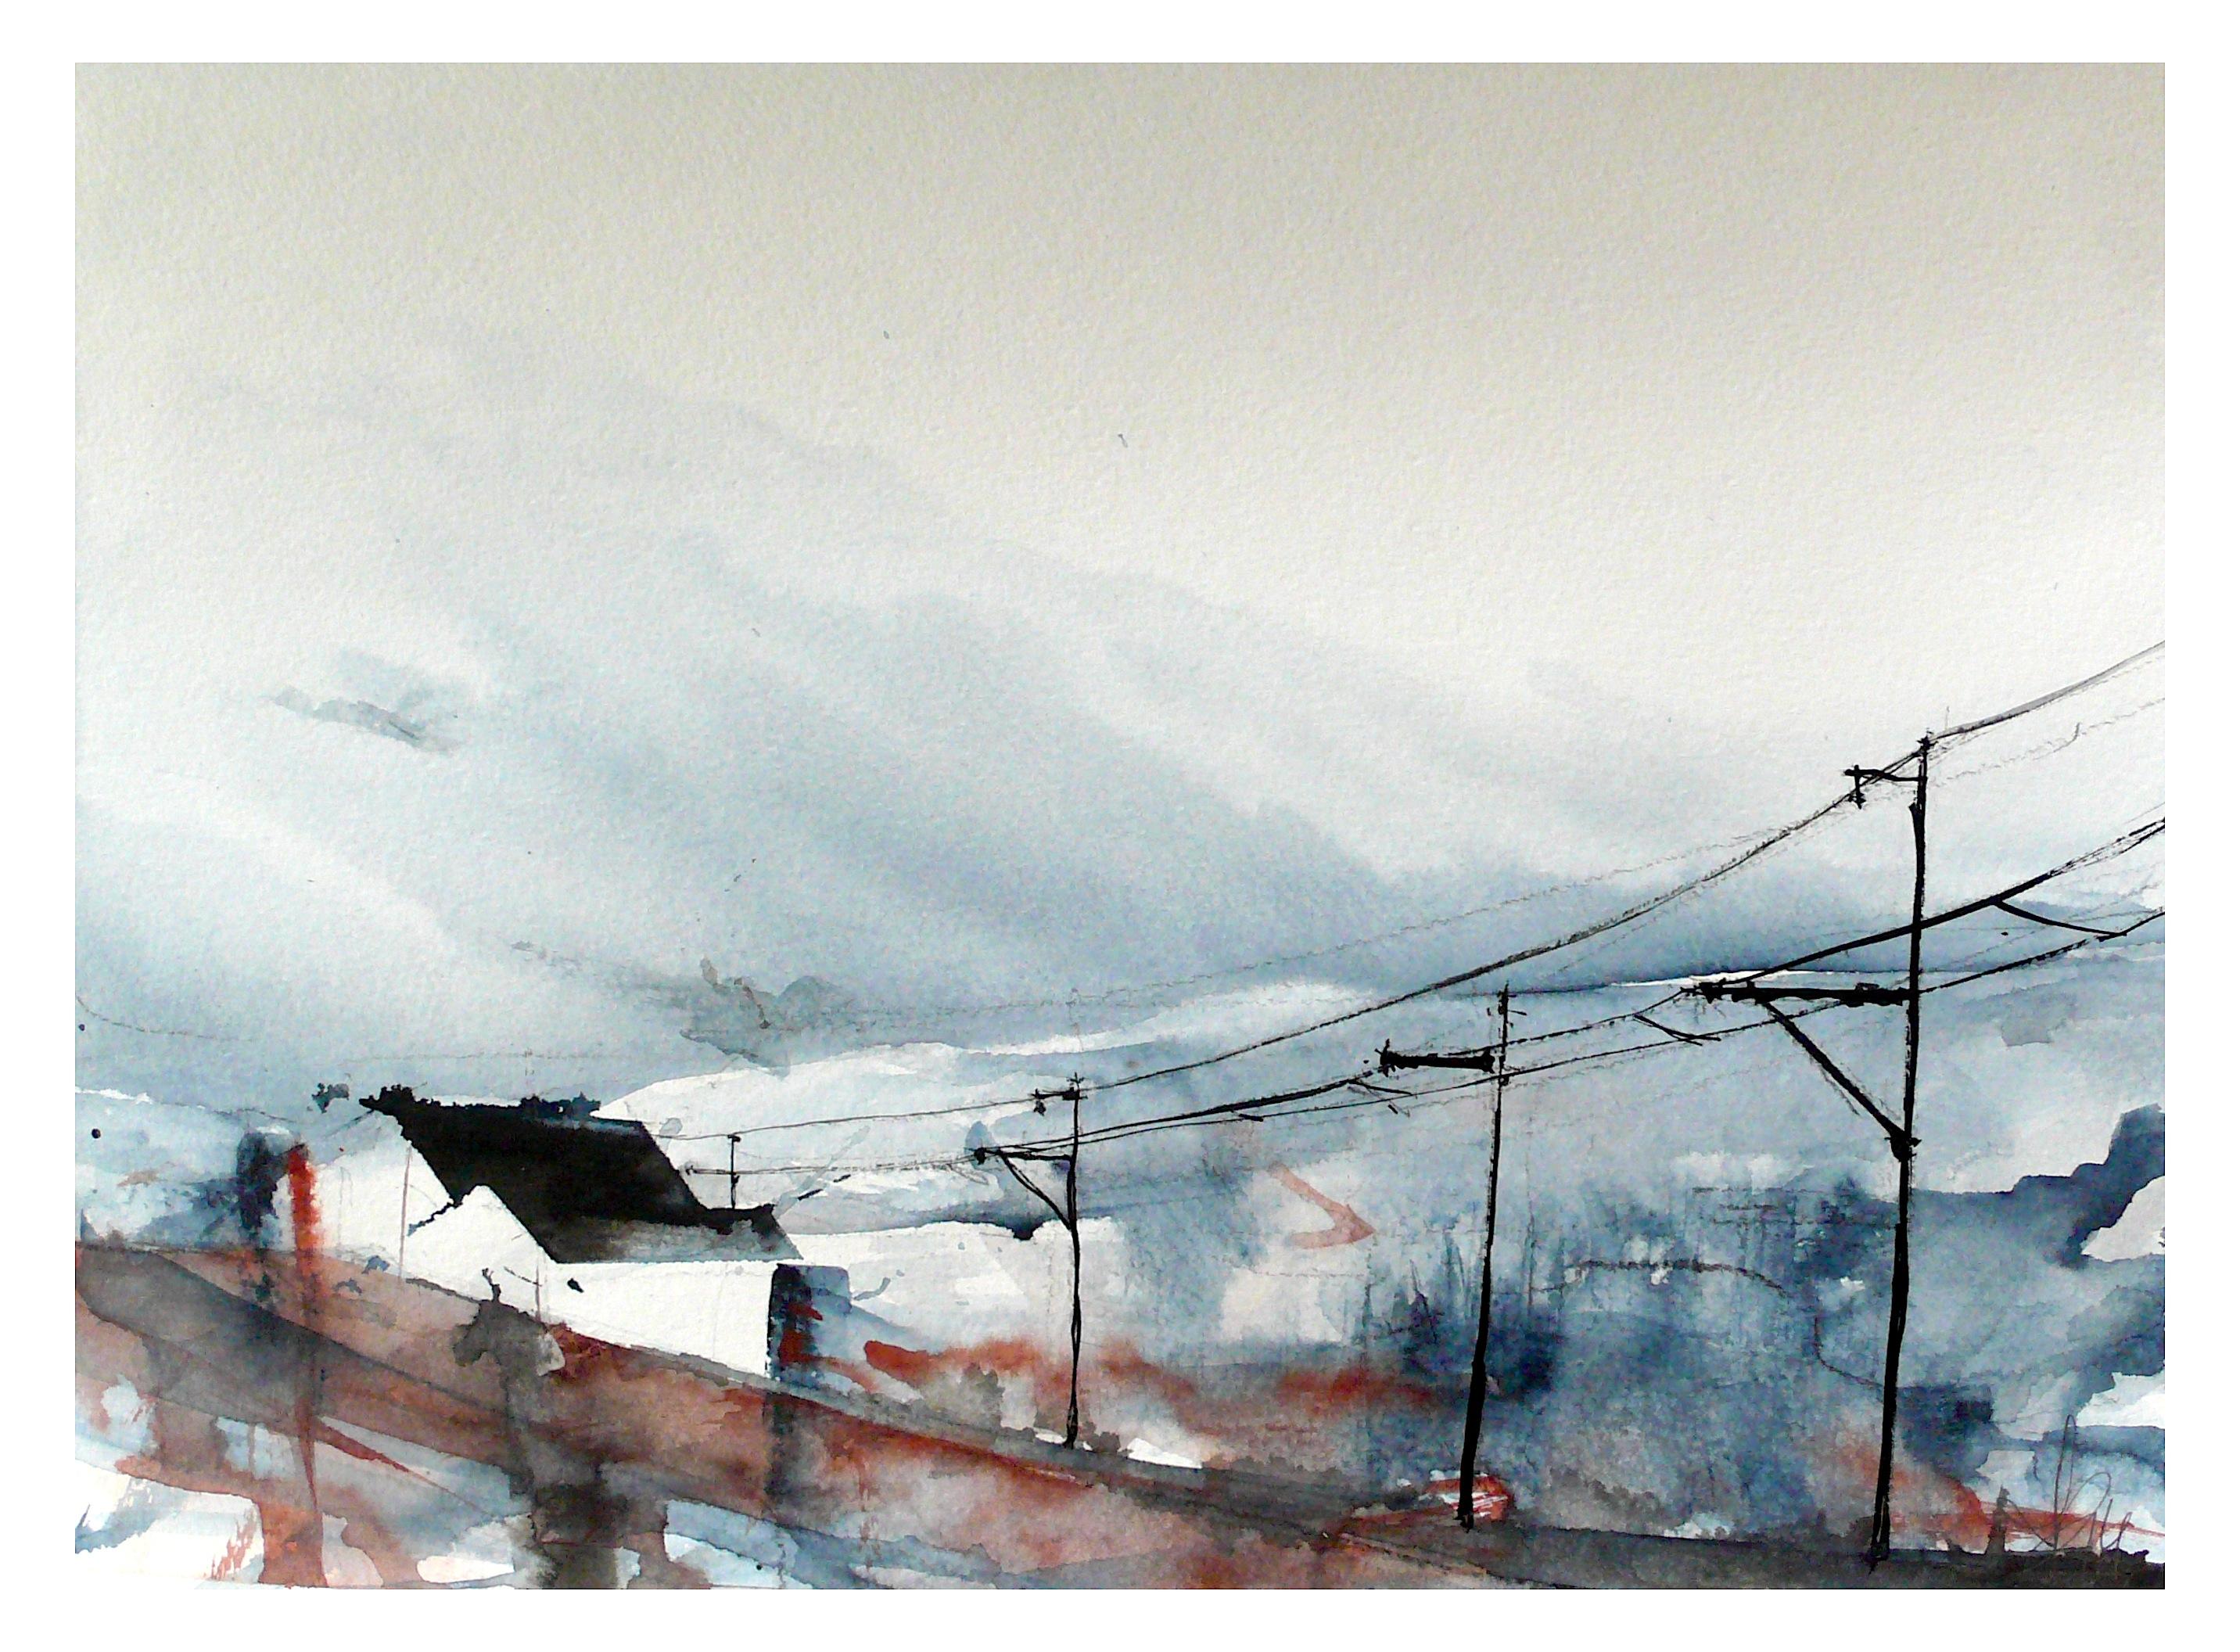 Fondos de pantalla : paisaje, dibujo, agua, invierno, la carretera ...